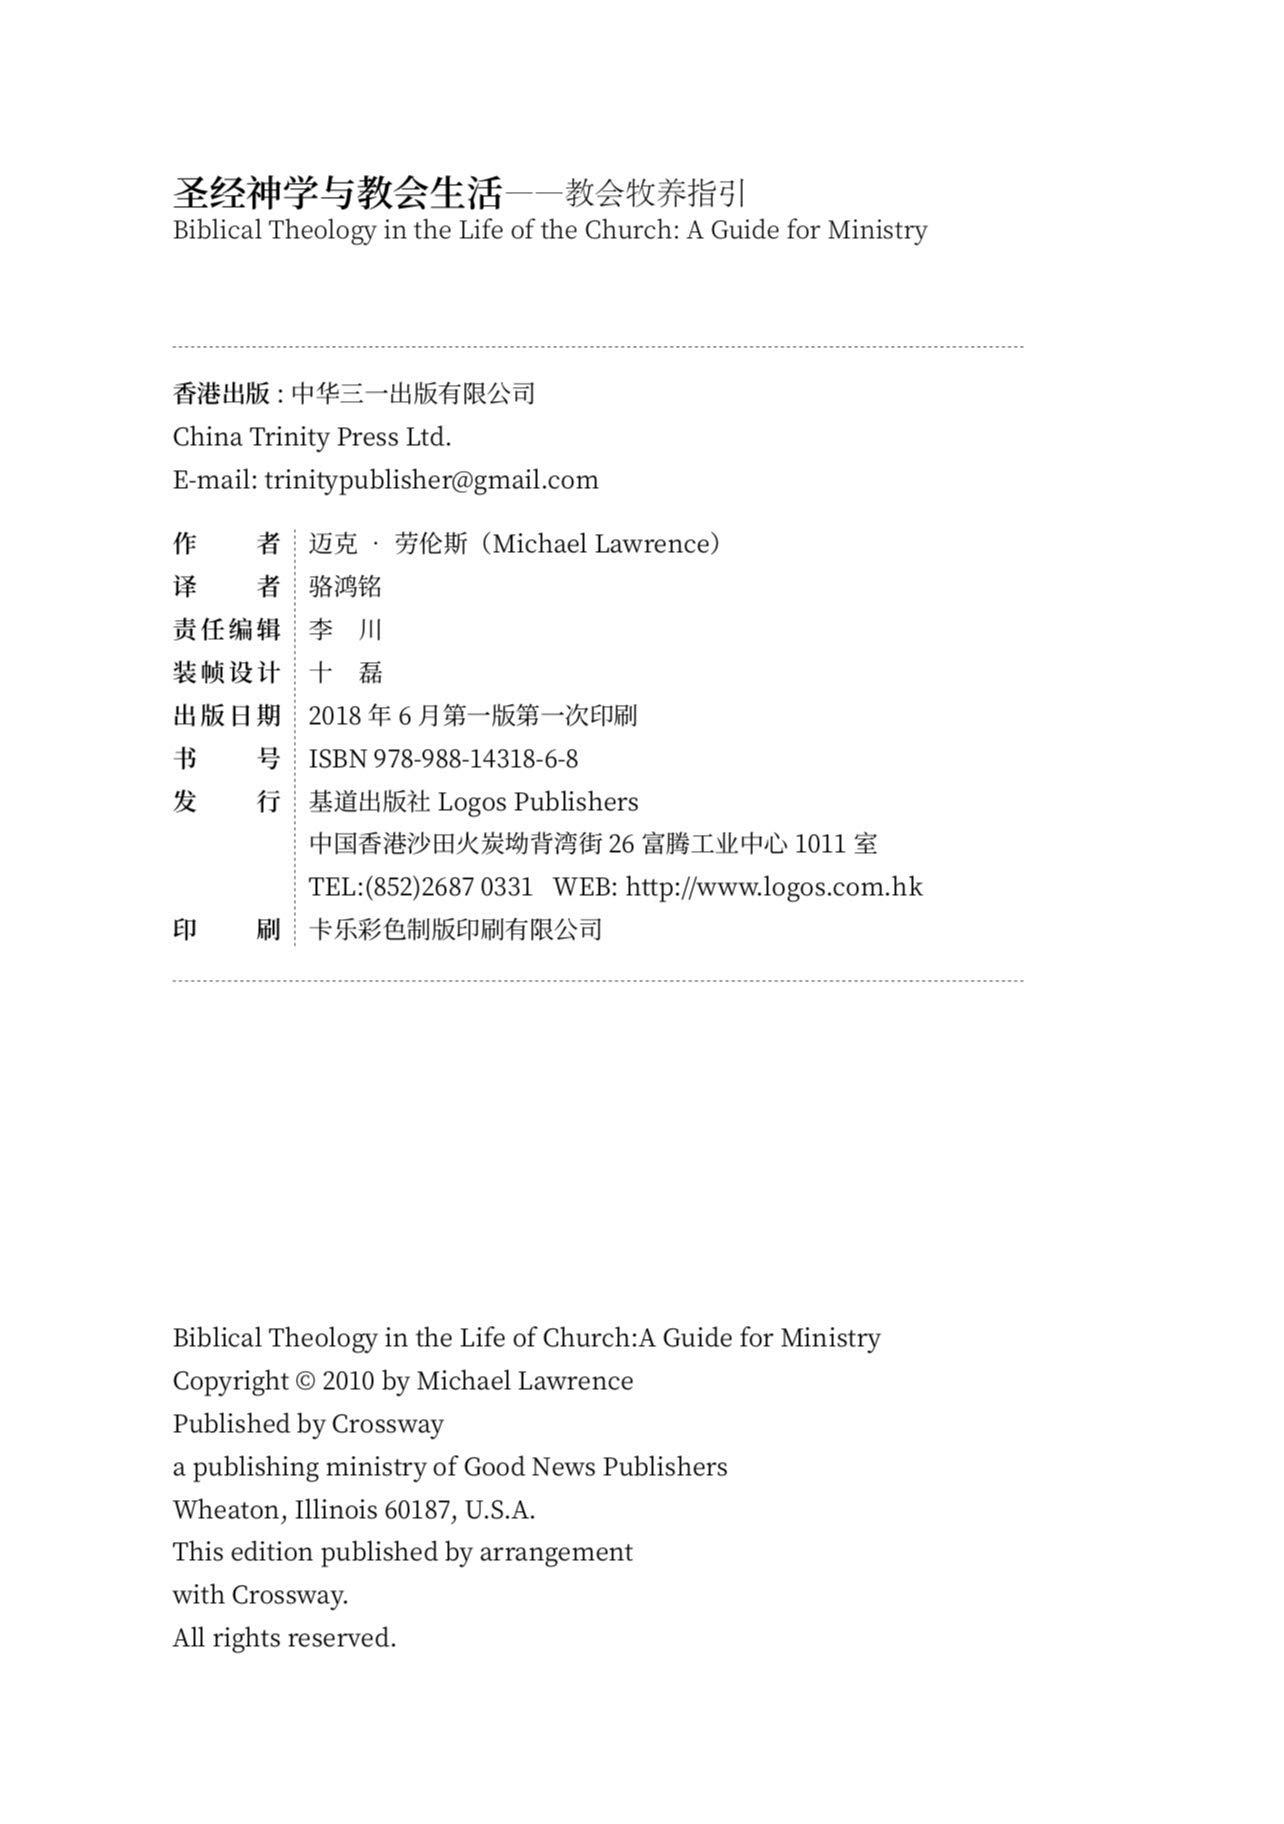 圣经神学与教会生活--教会牧养指引(Biblical Theology in the Life of the Church: A Guide for  Ministry): 迈克·劳伦斯(Michael Lawrence), 施赖纳, ...